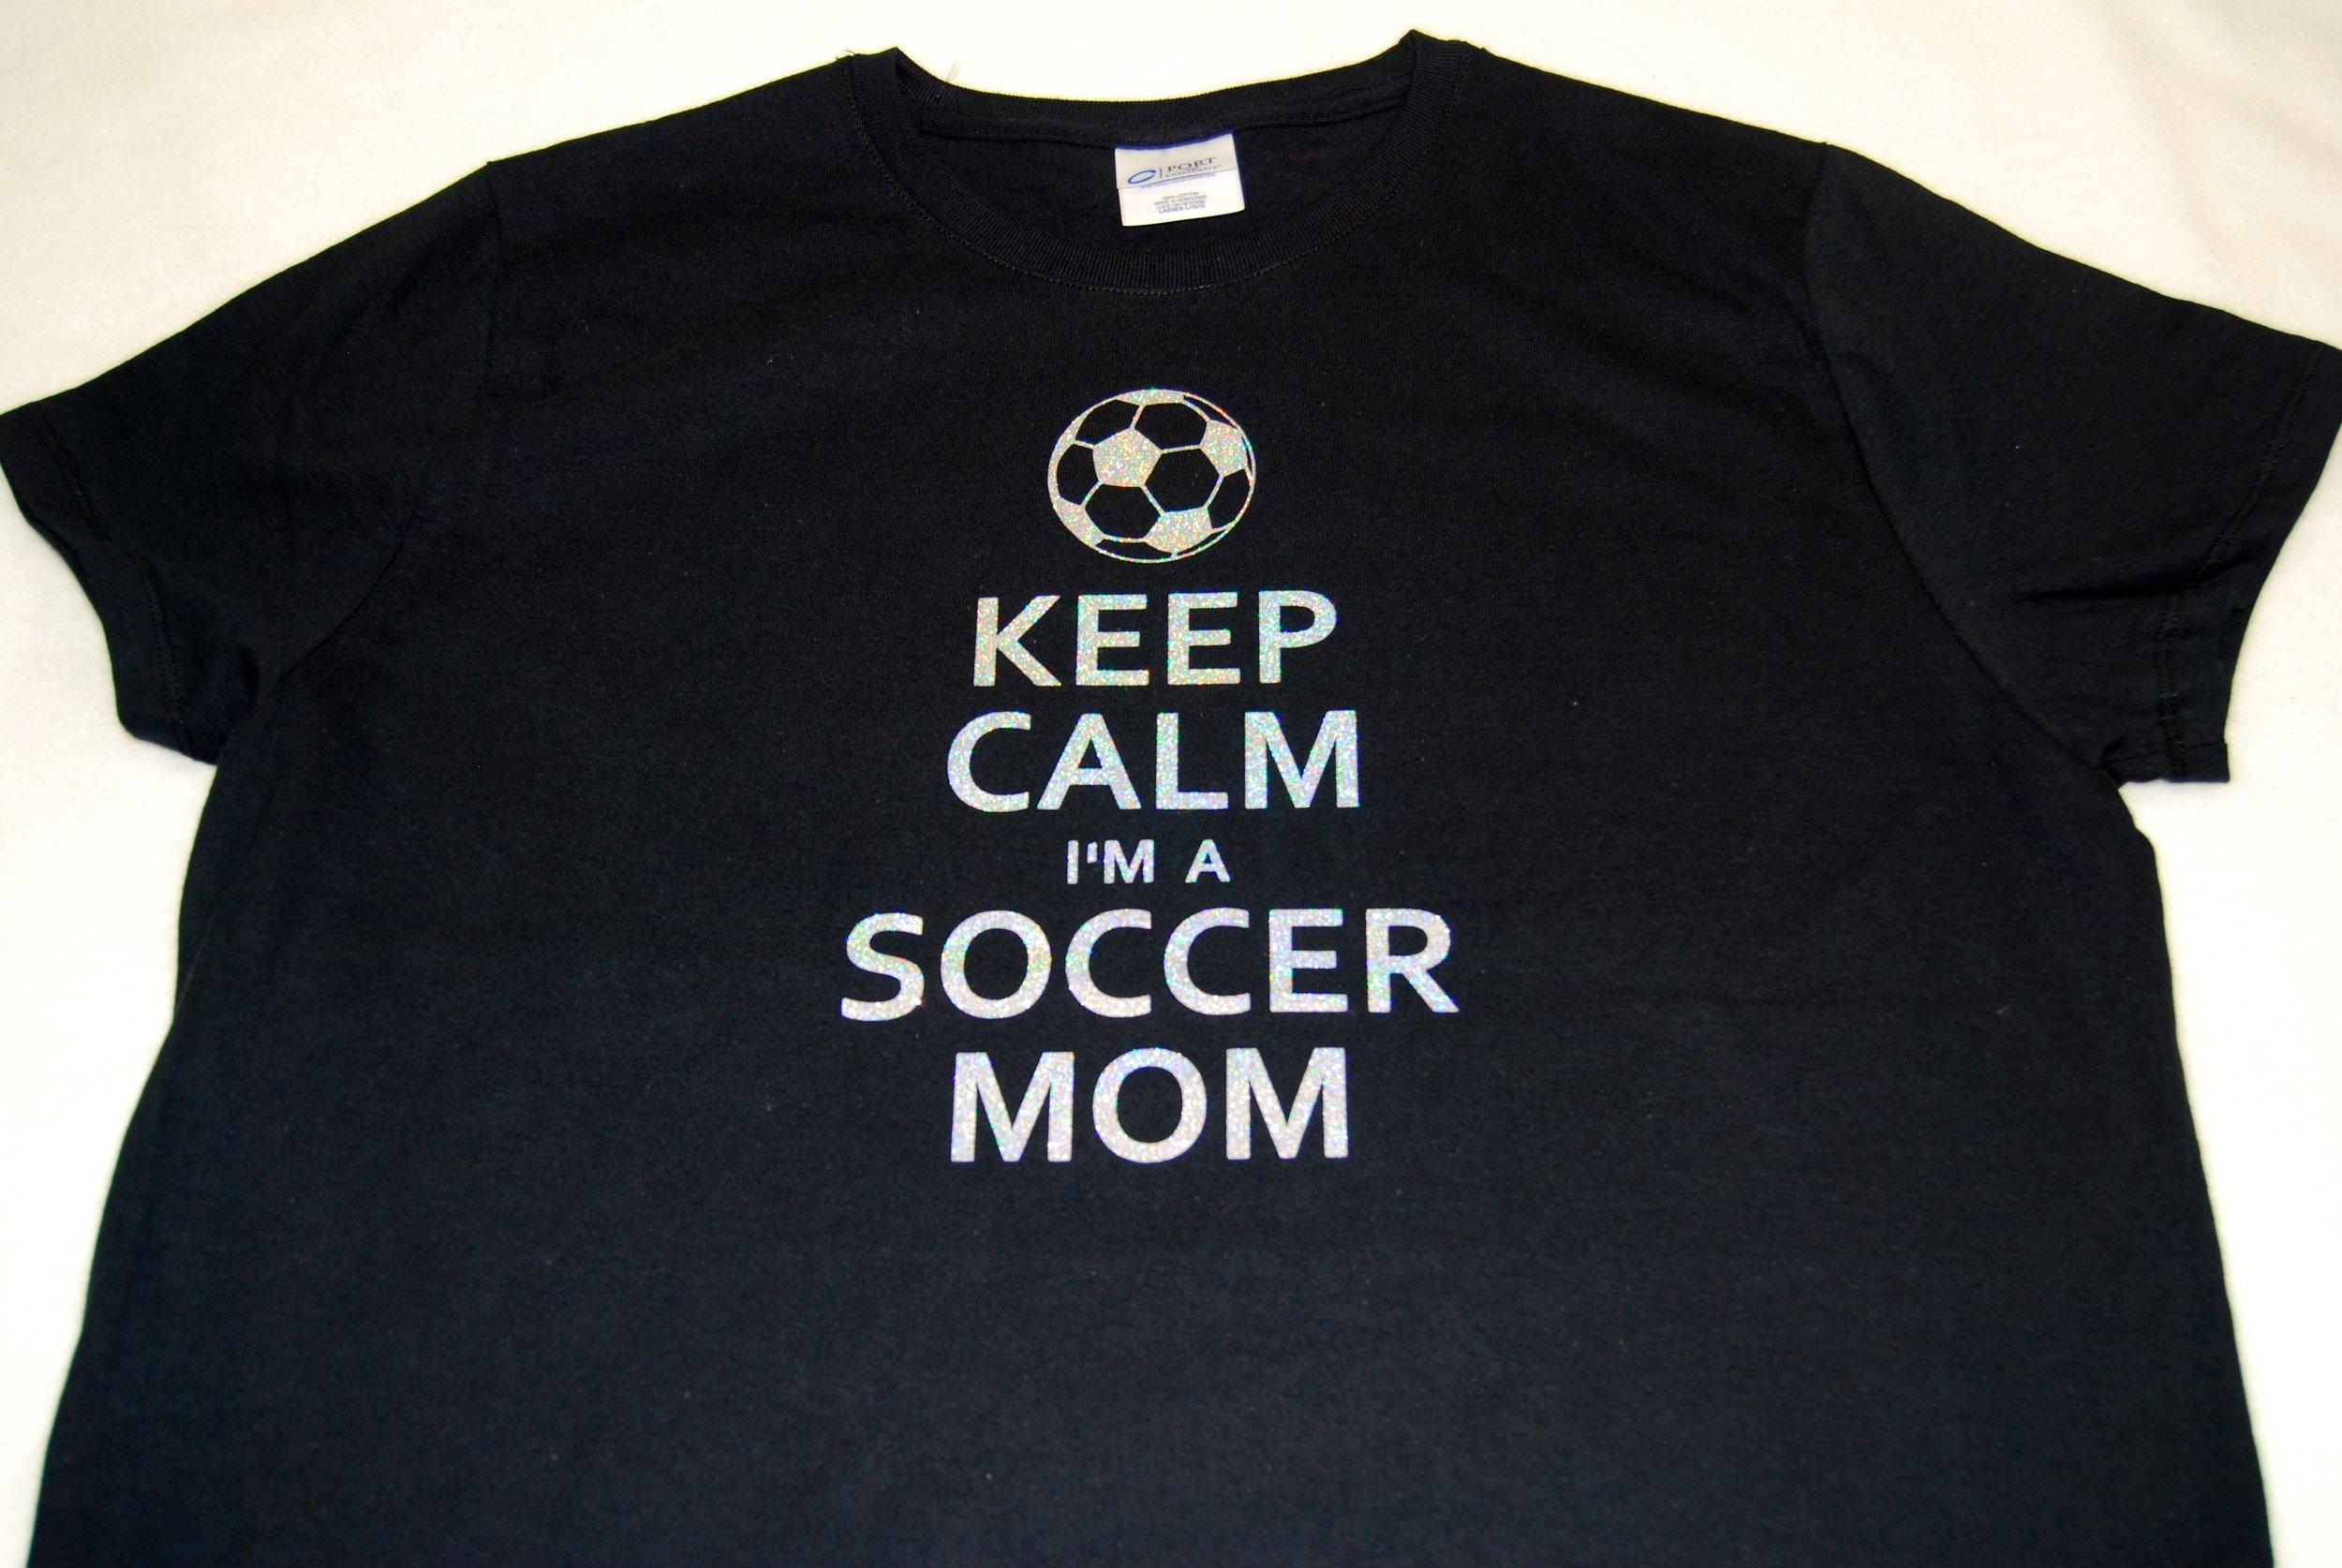 Keep Calm I'm A Soccer Mom in silver glitter